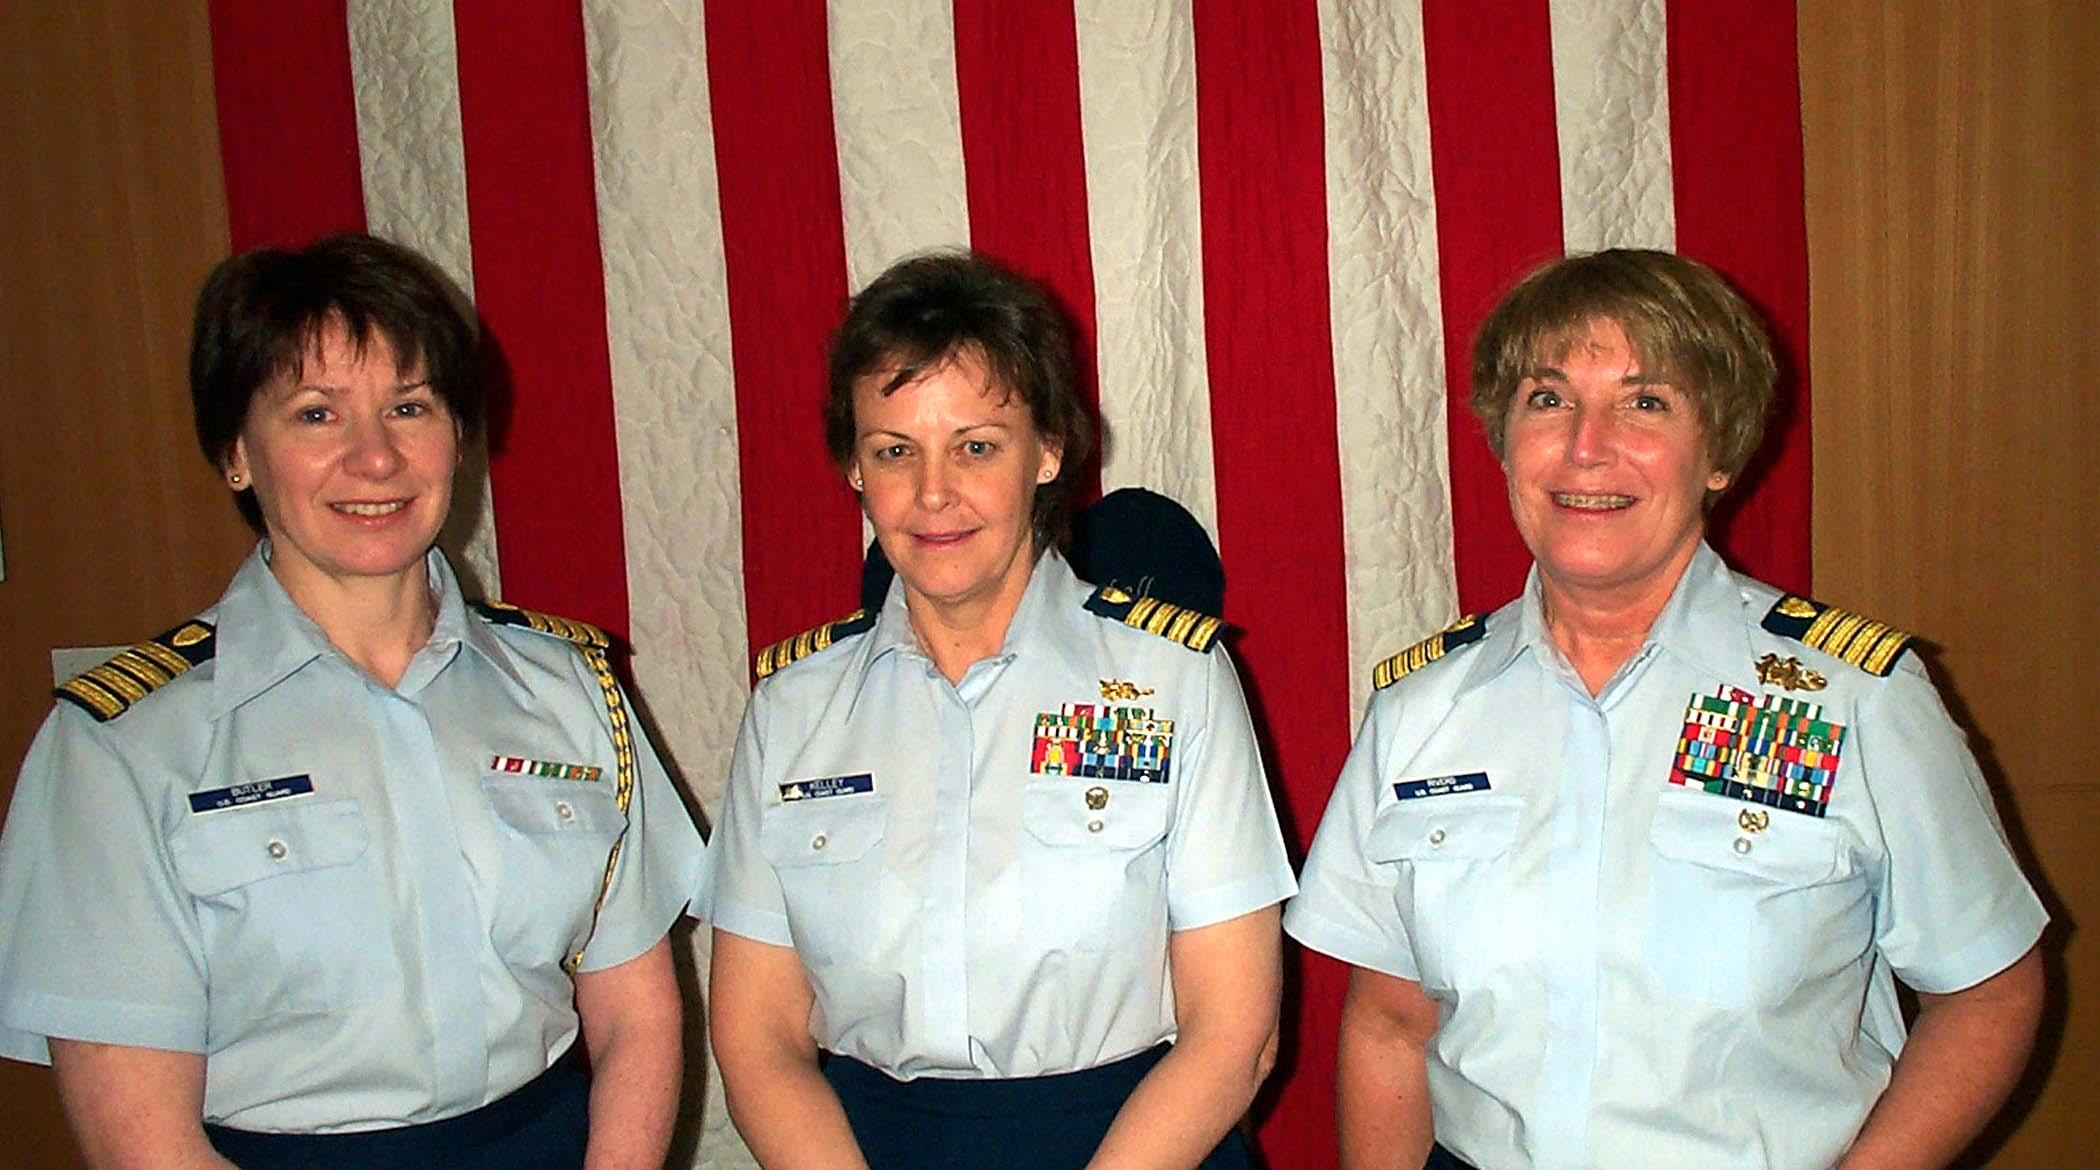 newagen women July 2016 – present (2 years 2 months)60 newagen colony rd  club, 2002- 2005 member, latino club, 2002 member, women's basketball team, 2001- 2003.